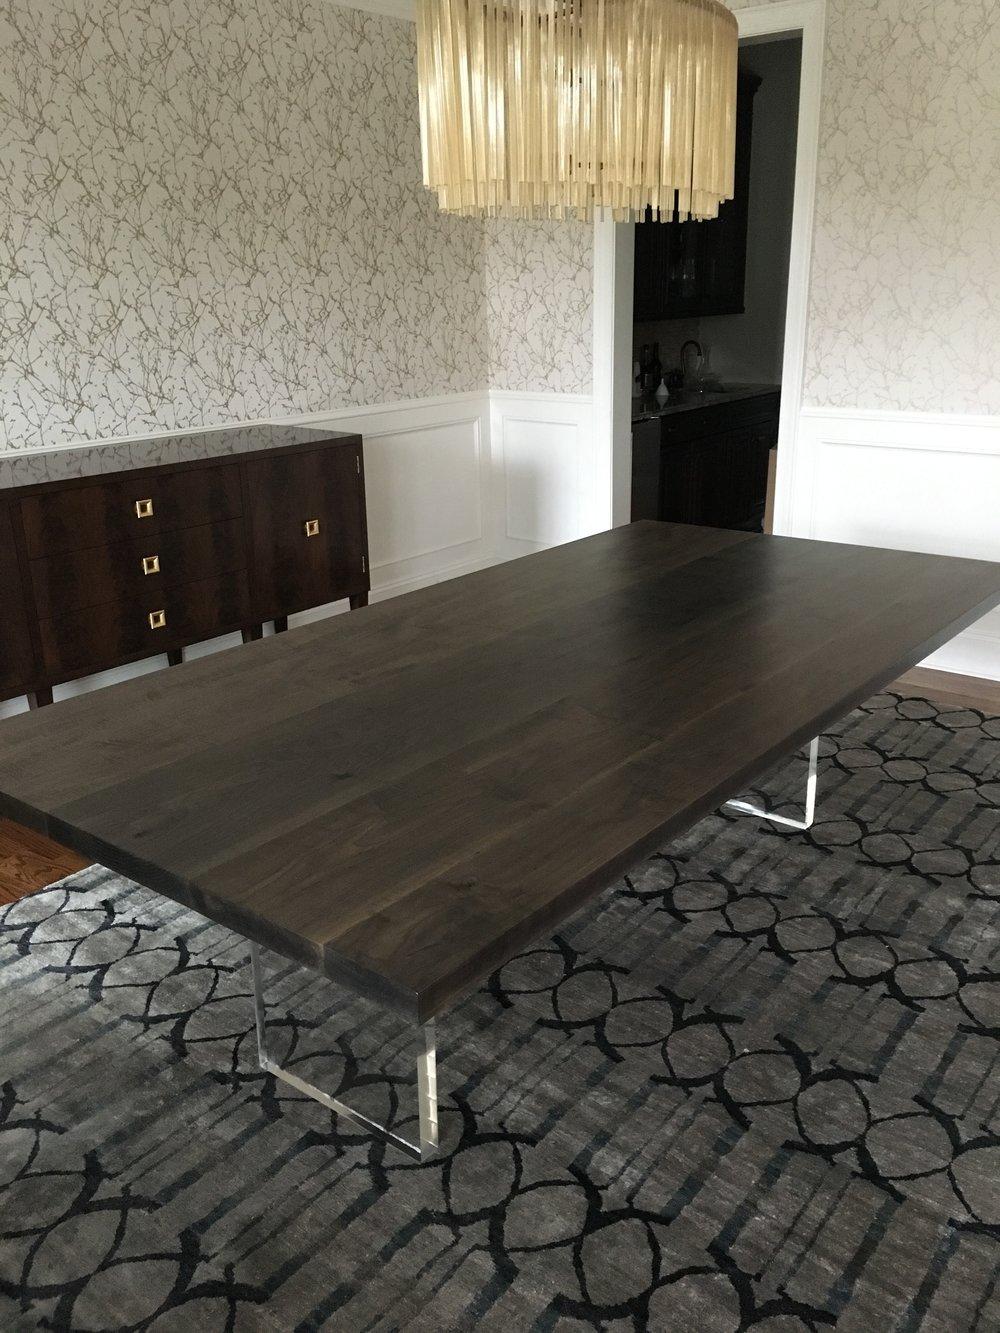 Josh Utsey Designs Custom Furniture Charlotte Nc Oxidized Maple Dining  Table Acrylic Lucite.JPG